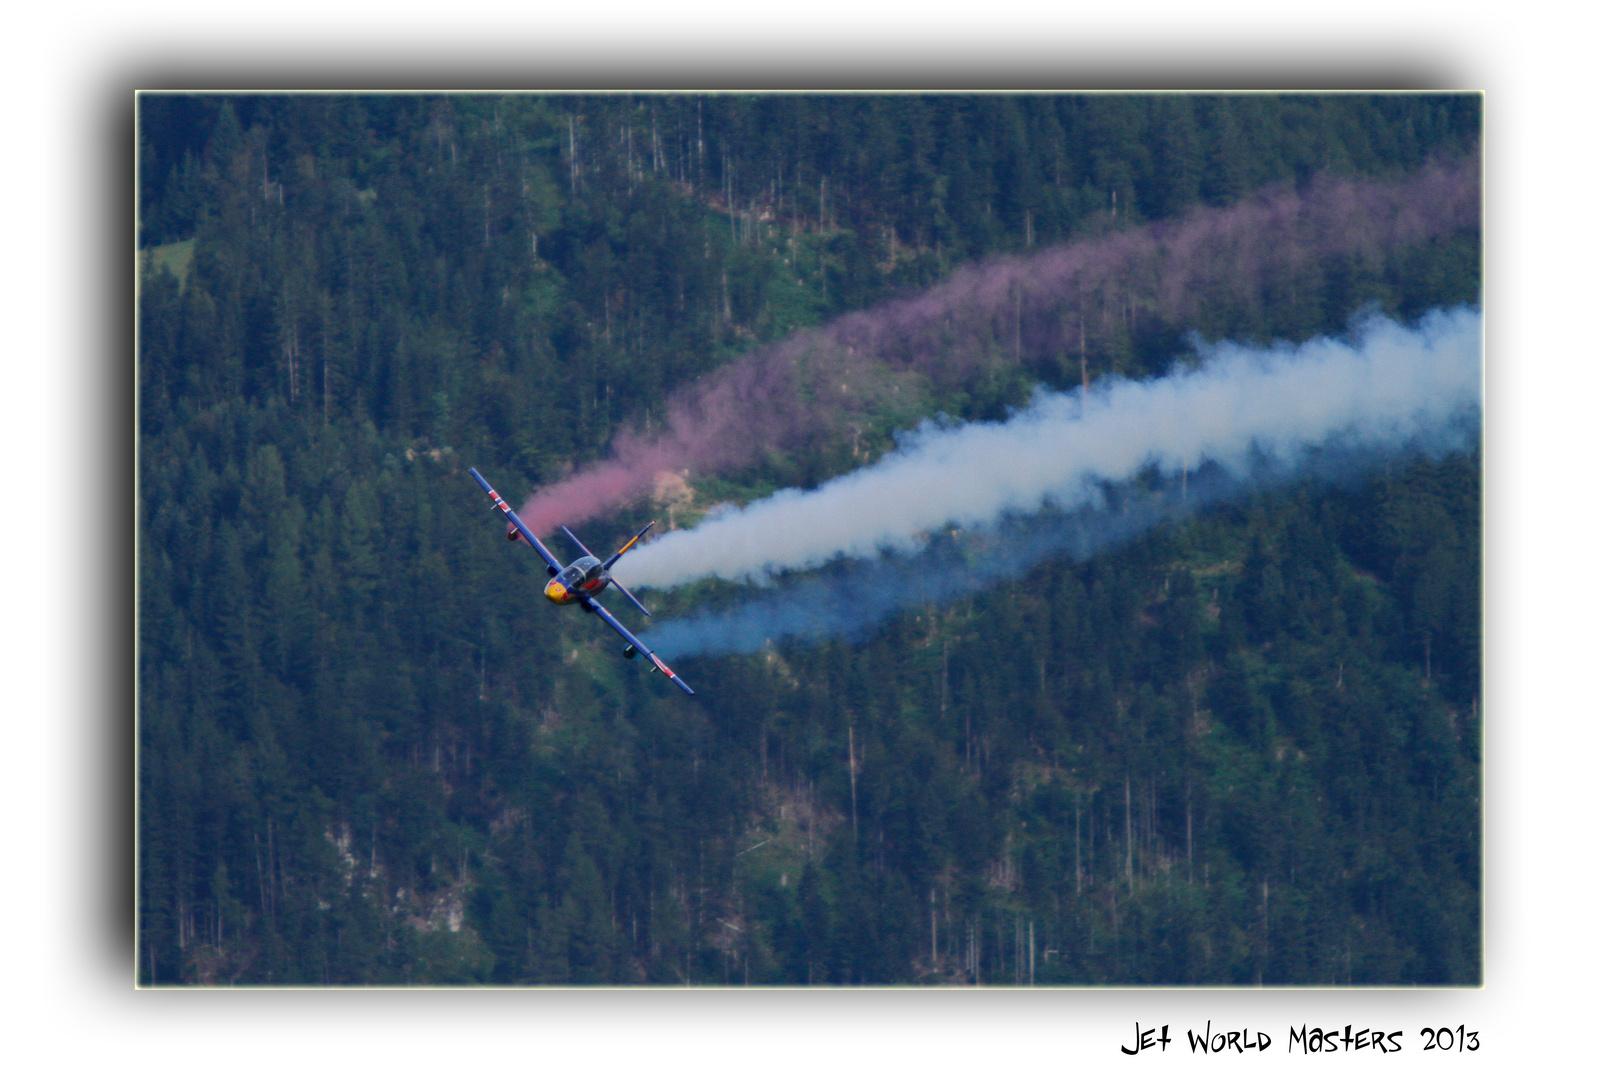 Jet World Masters 2013...